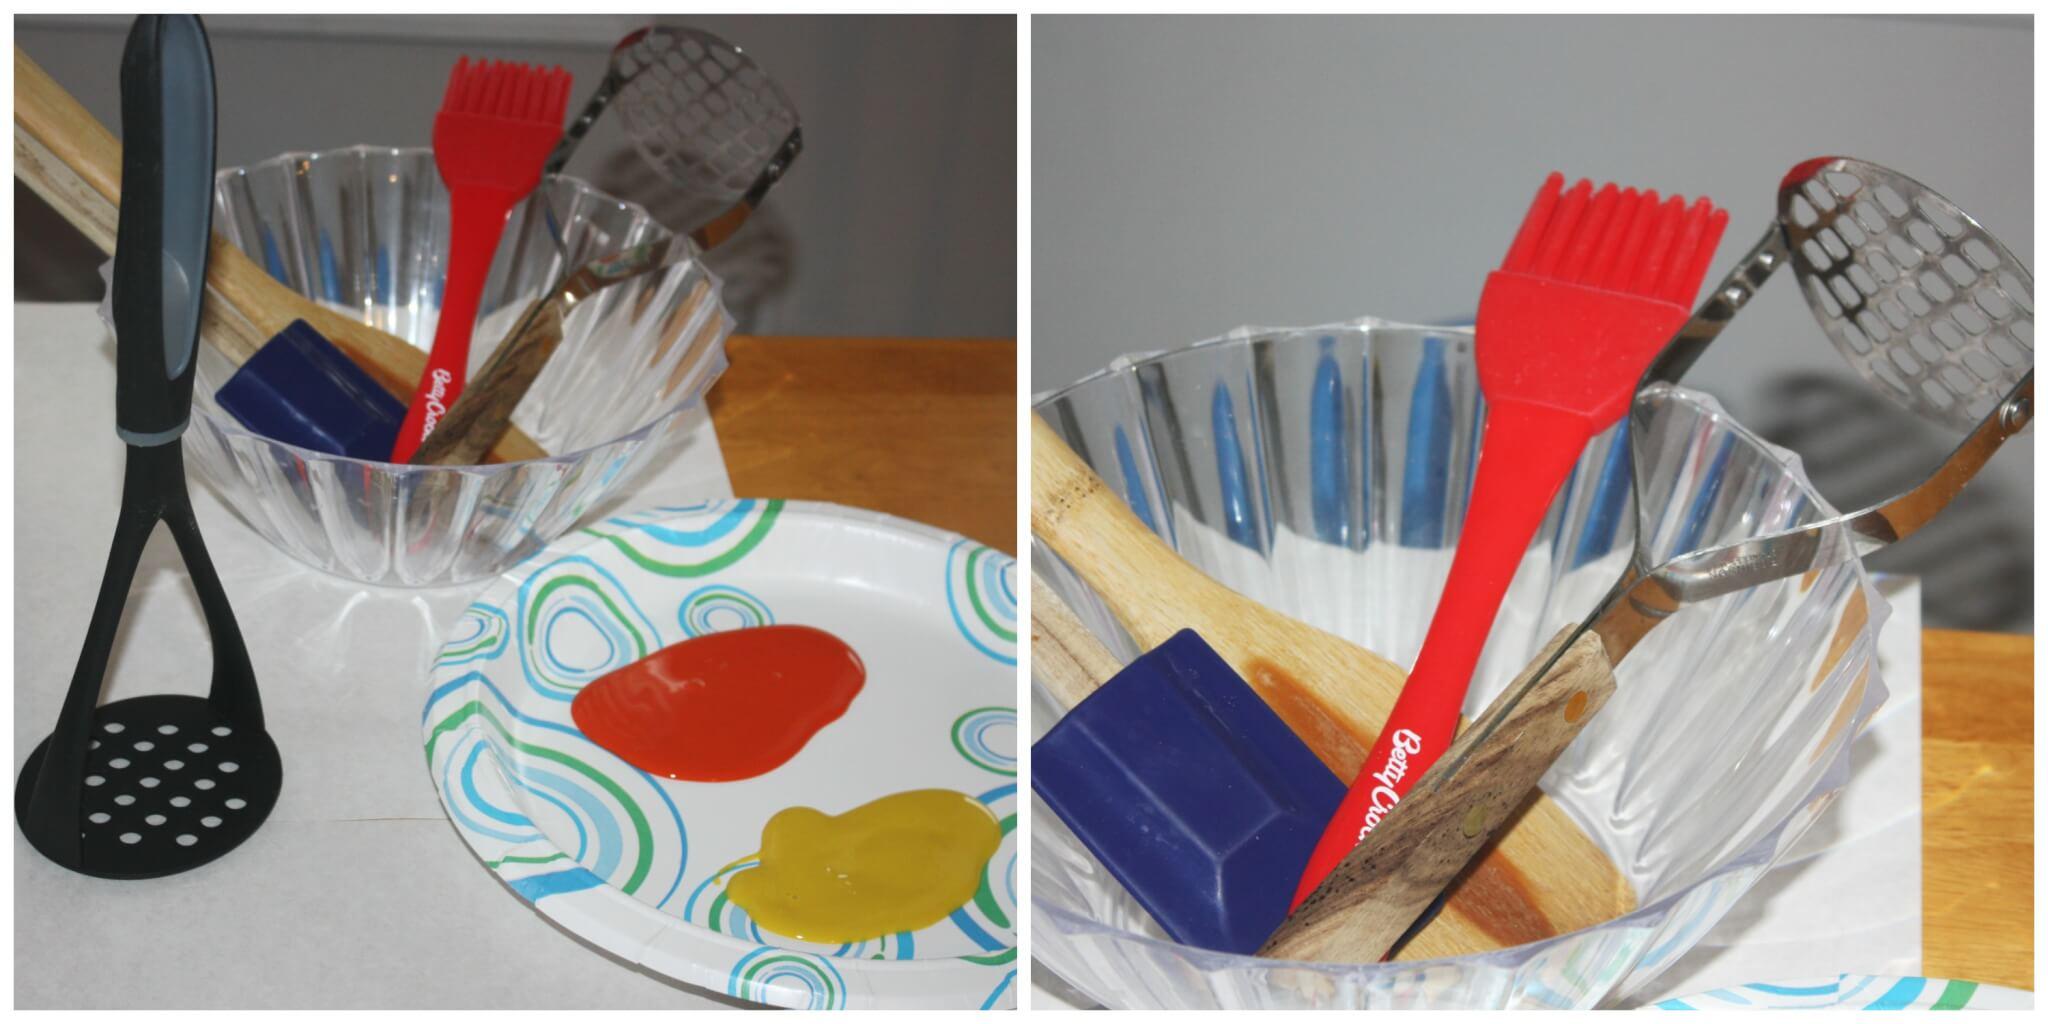 Kitchen Utensil Preschool Painting Activity